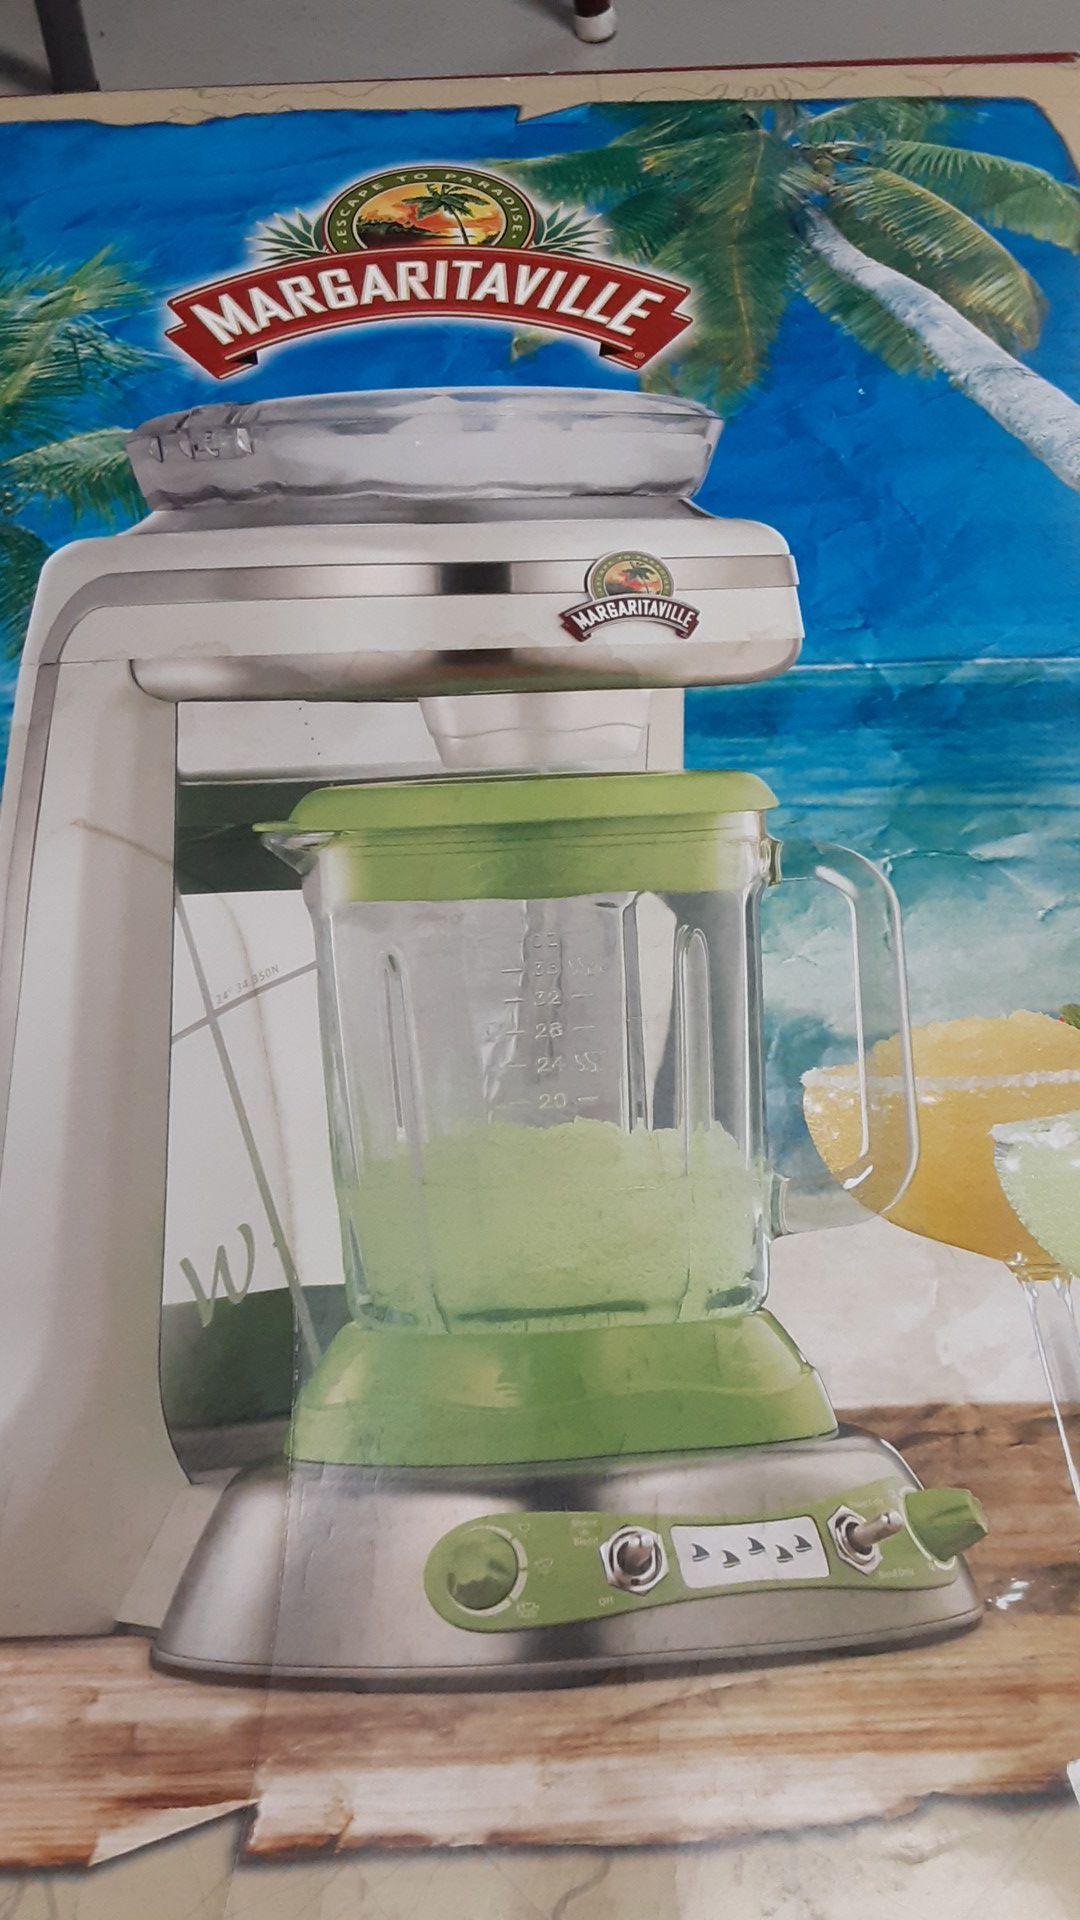 Margarita maker